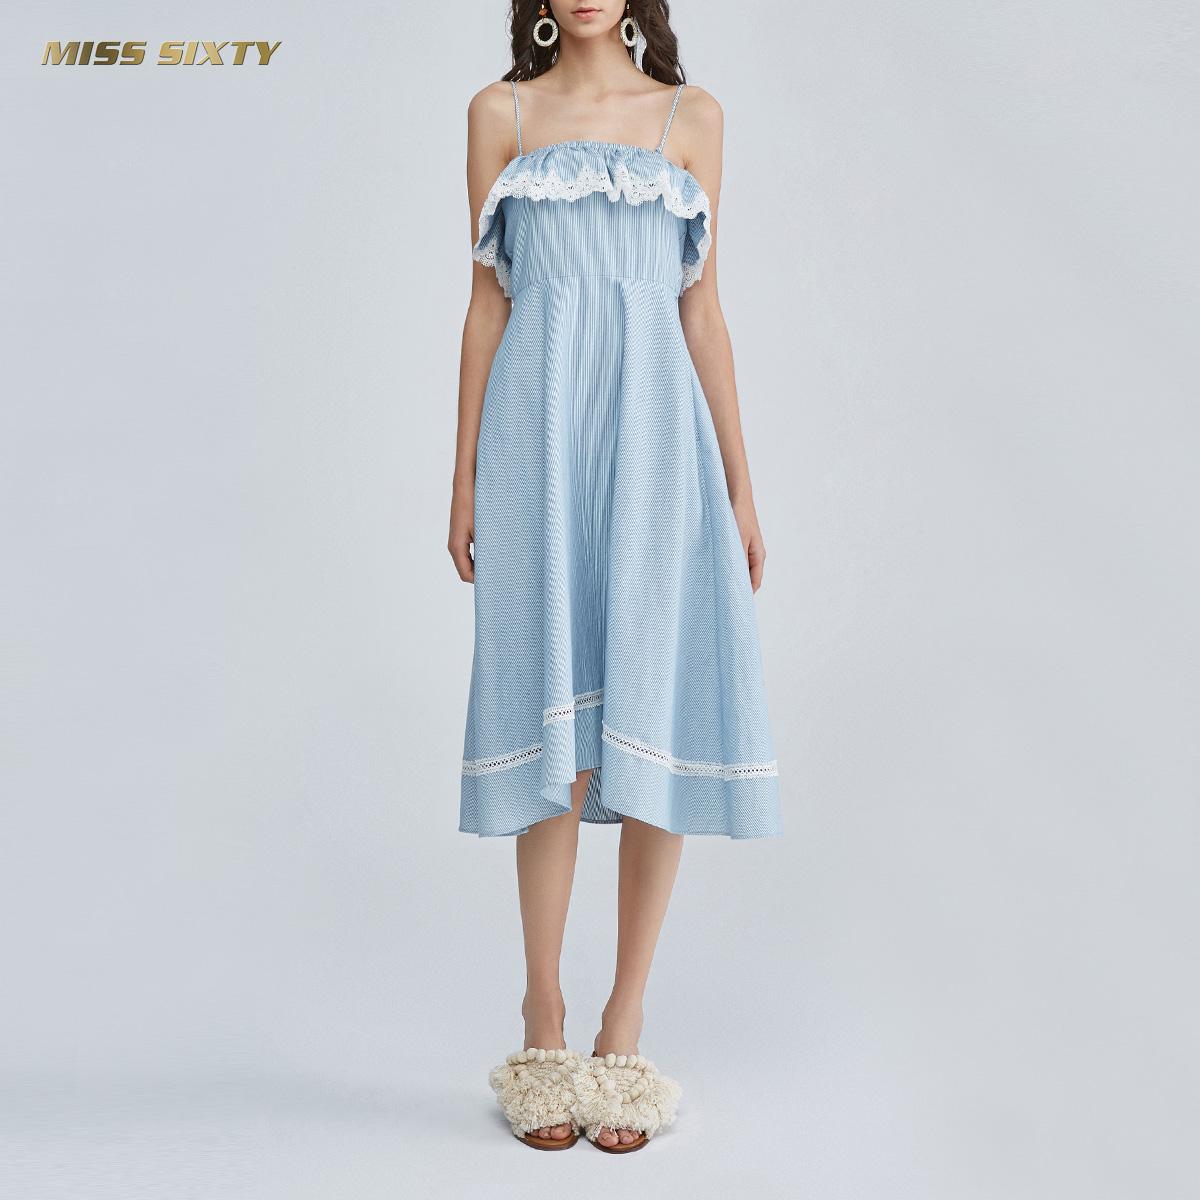 C Miss Sixty2018新款夏季纯棉条纹无袖牛仔连衣裙女682DJ0570000